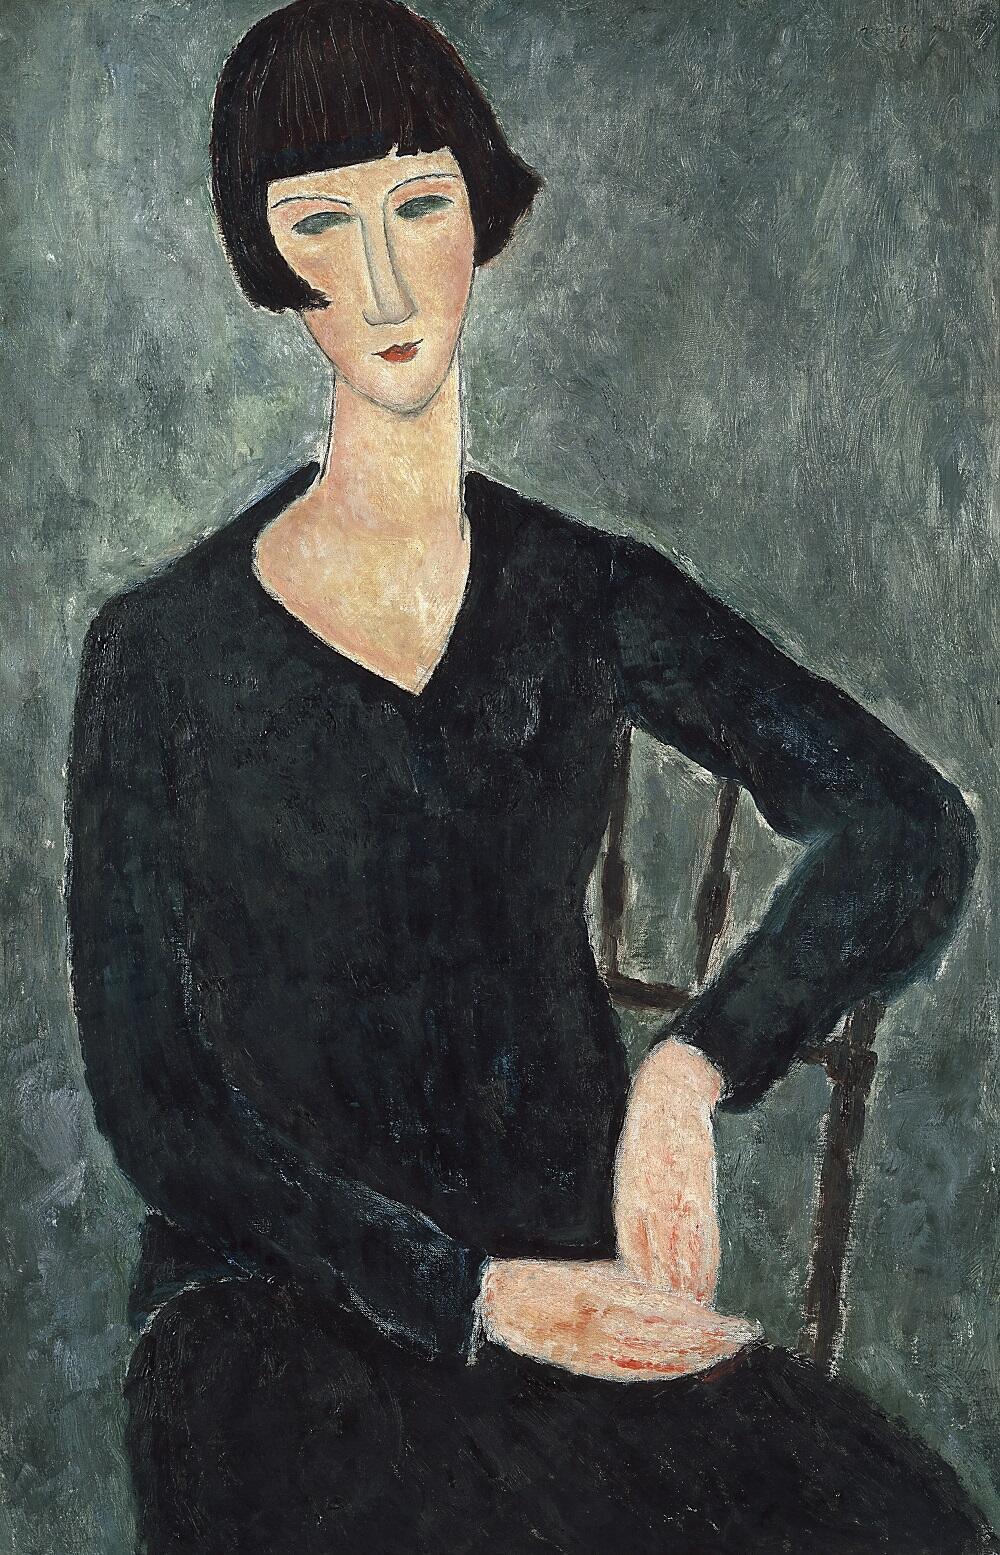 Amedeo Modigliani, Mujer sentada con vestido azul1918-1919. 92 x 60 cm. Moderna Museet, Stockholm. Donativo de Oscar Stern, 1951.